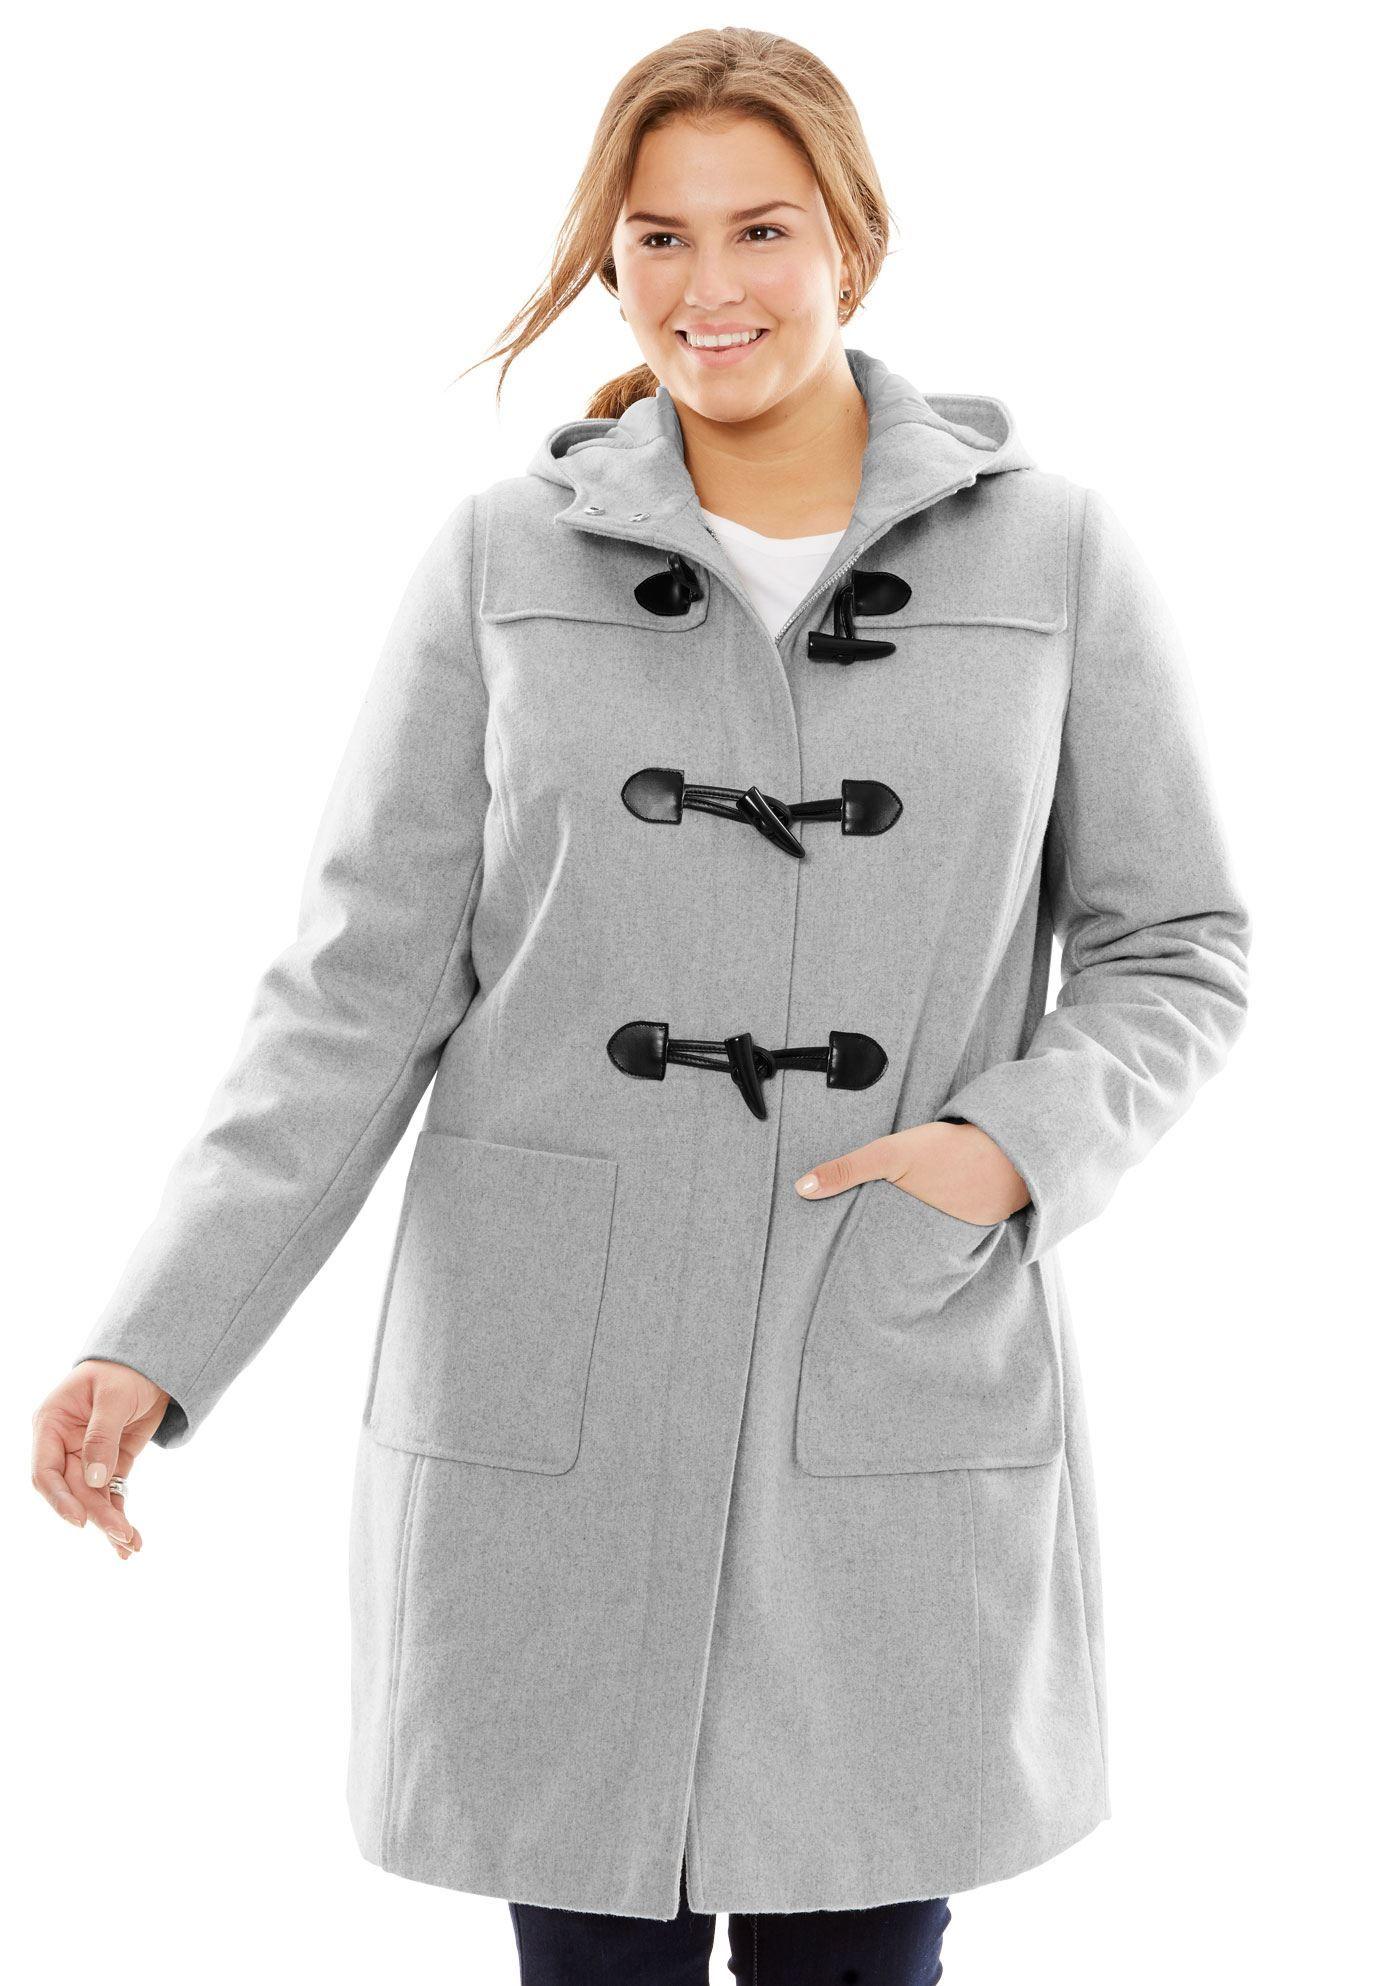 b605ffa7a2a Classic duffle coat - Women s Plus Size Clothing